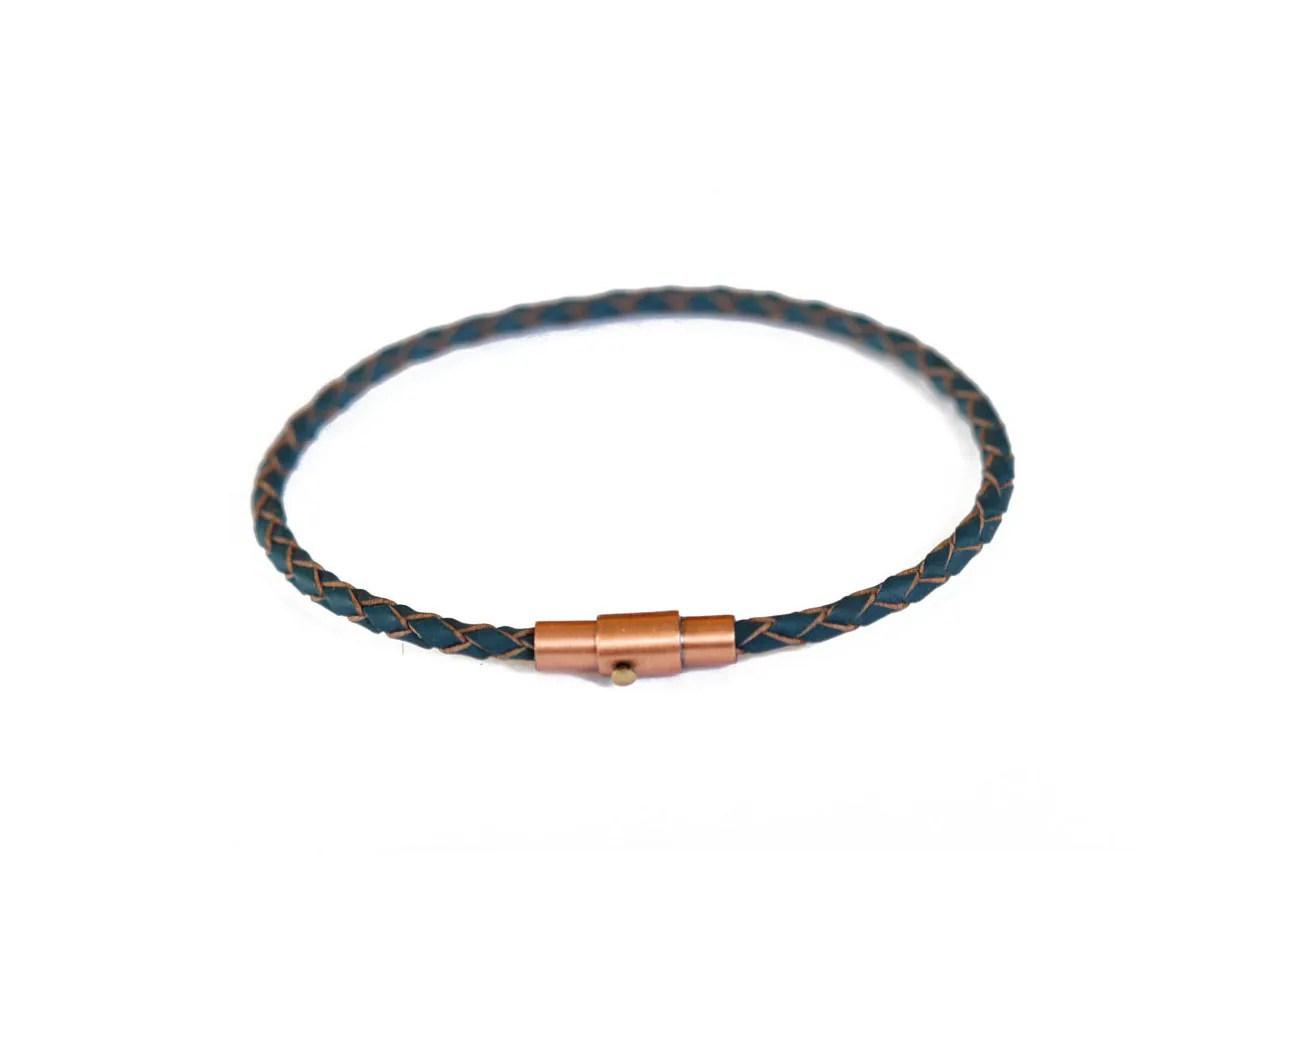 Unisex Thin Leather Bracelet/ Men's Thin Leather Bracelet/